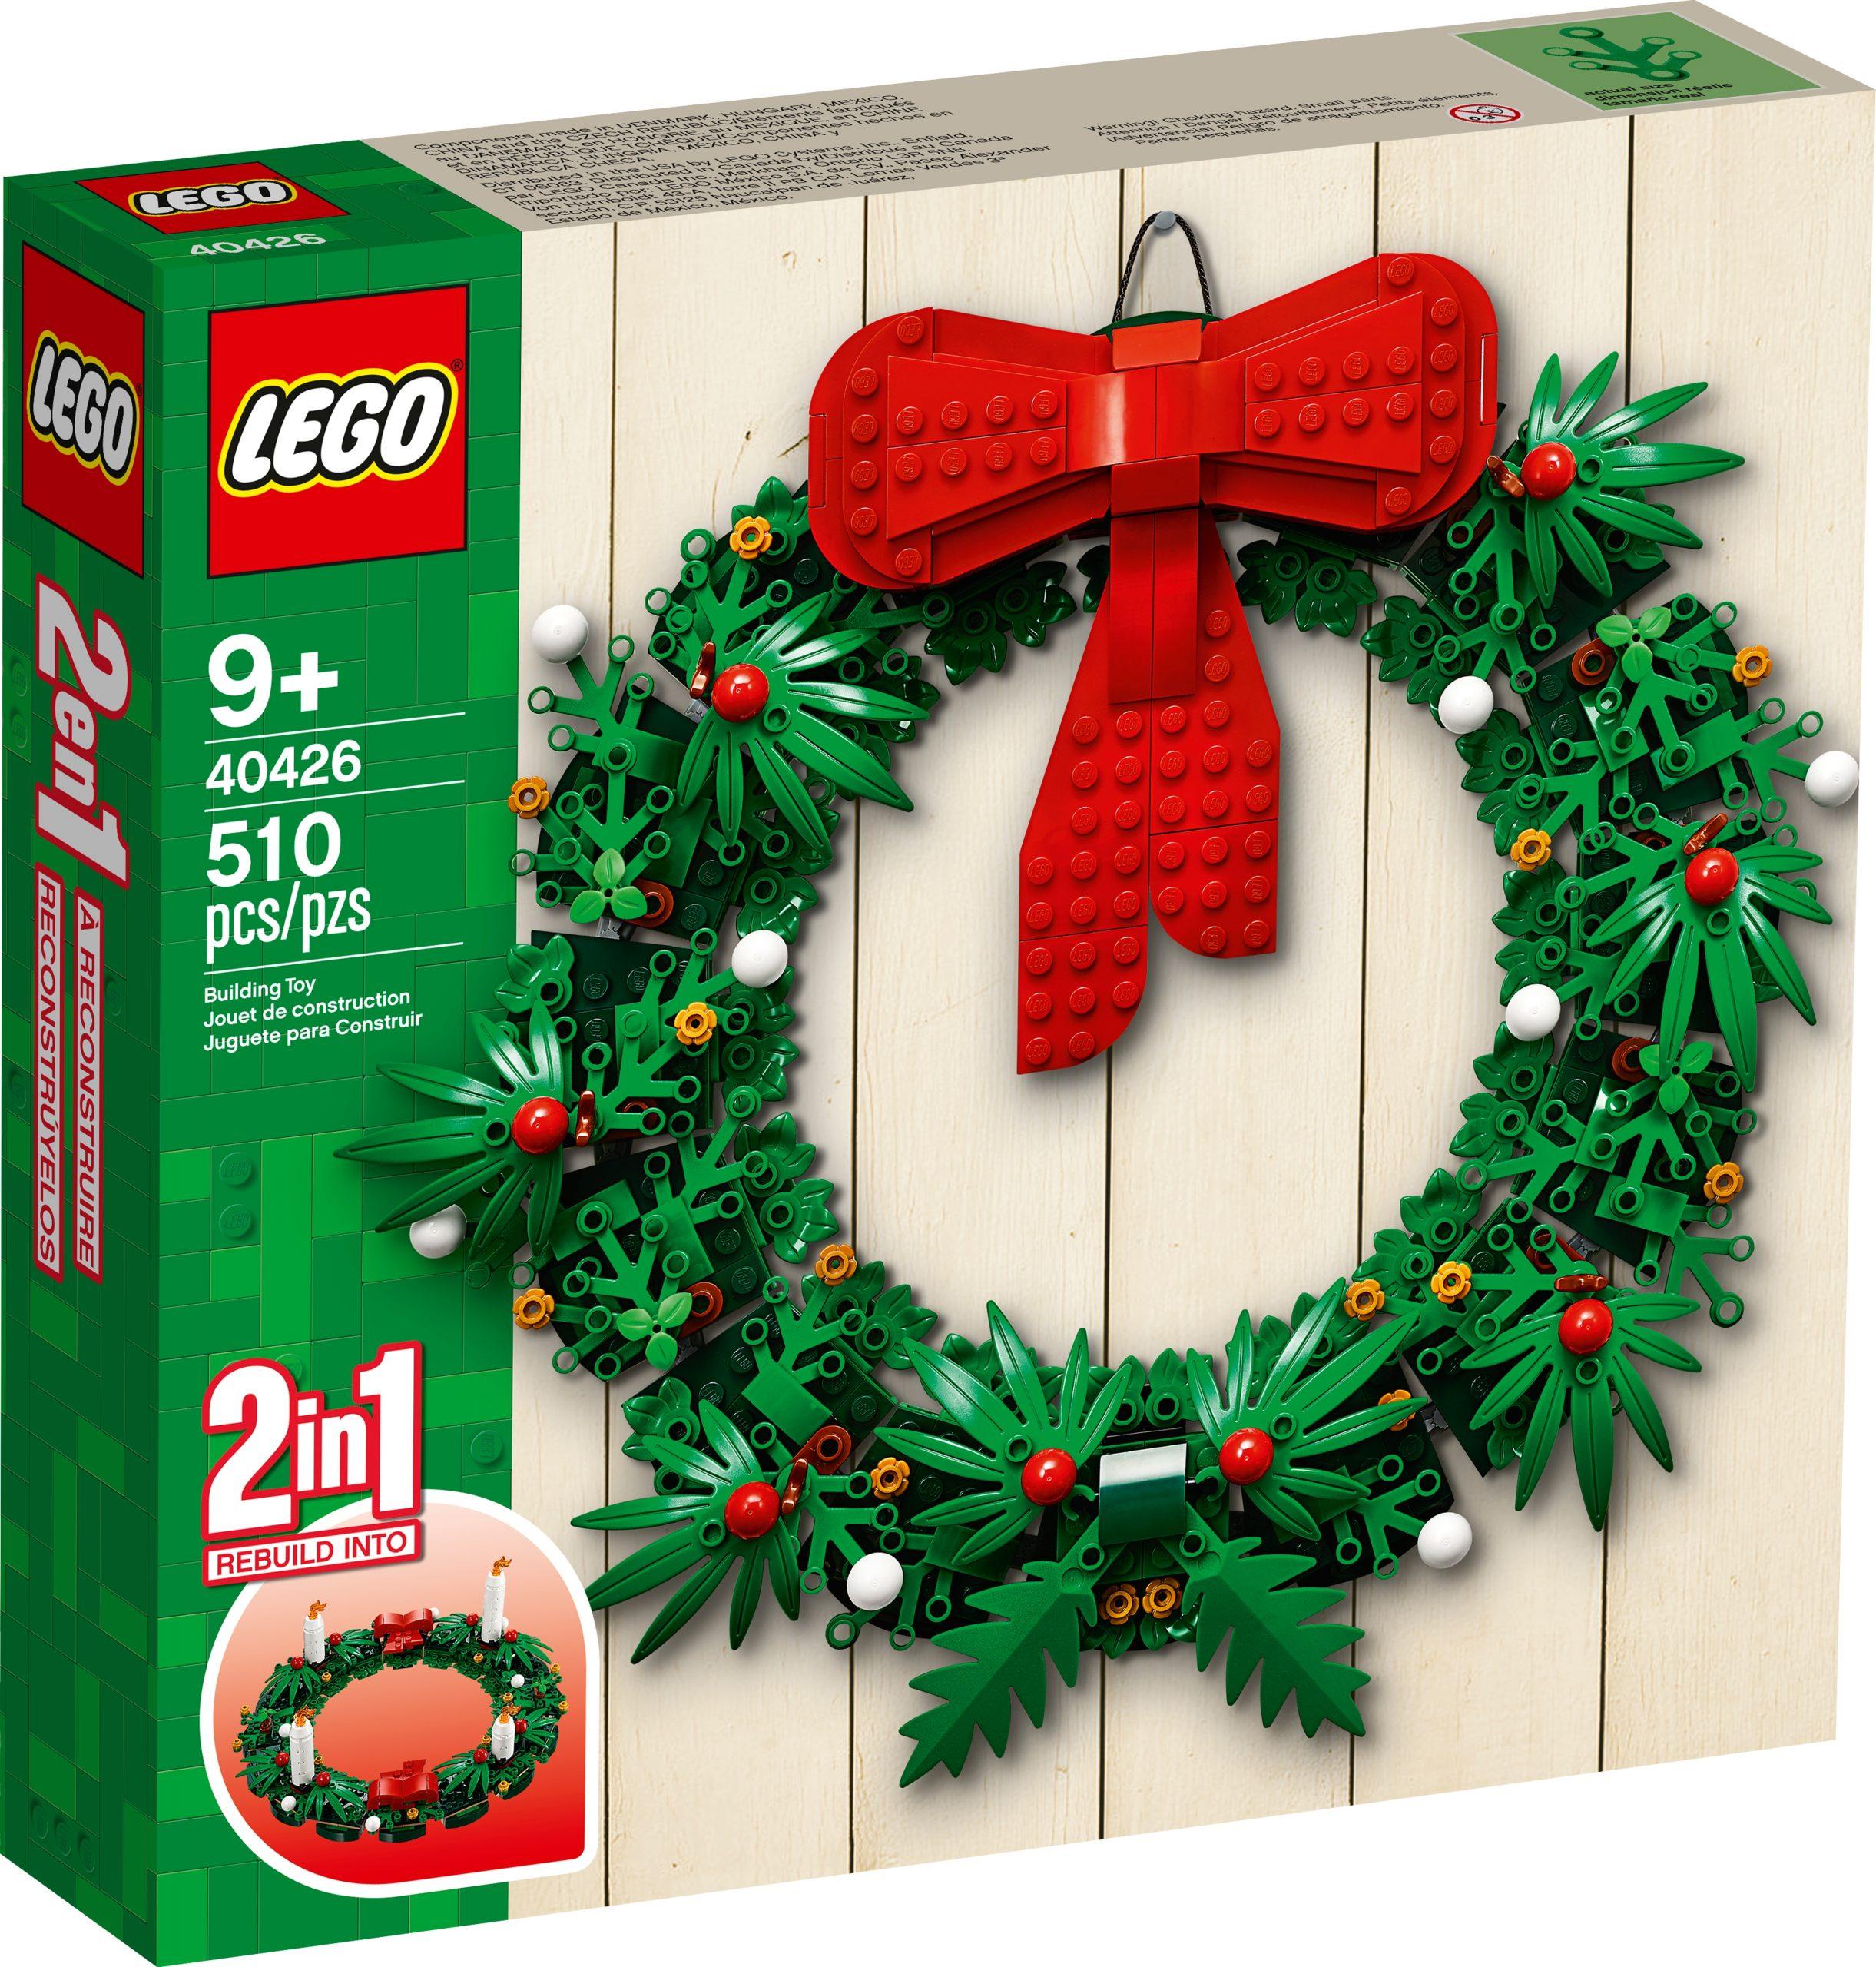 lego 40426 ghirlanda natalizia 2 in 1 scaled